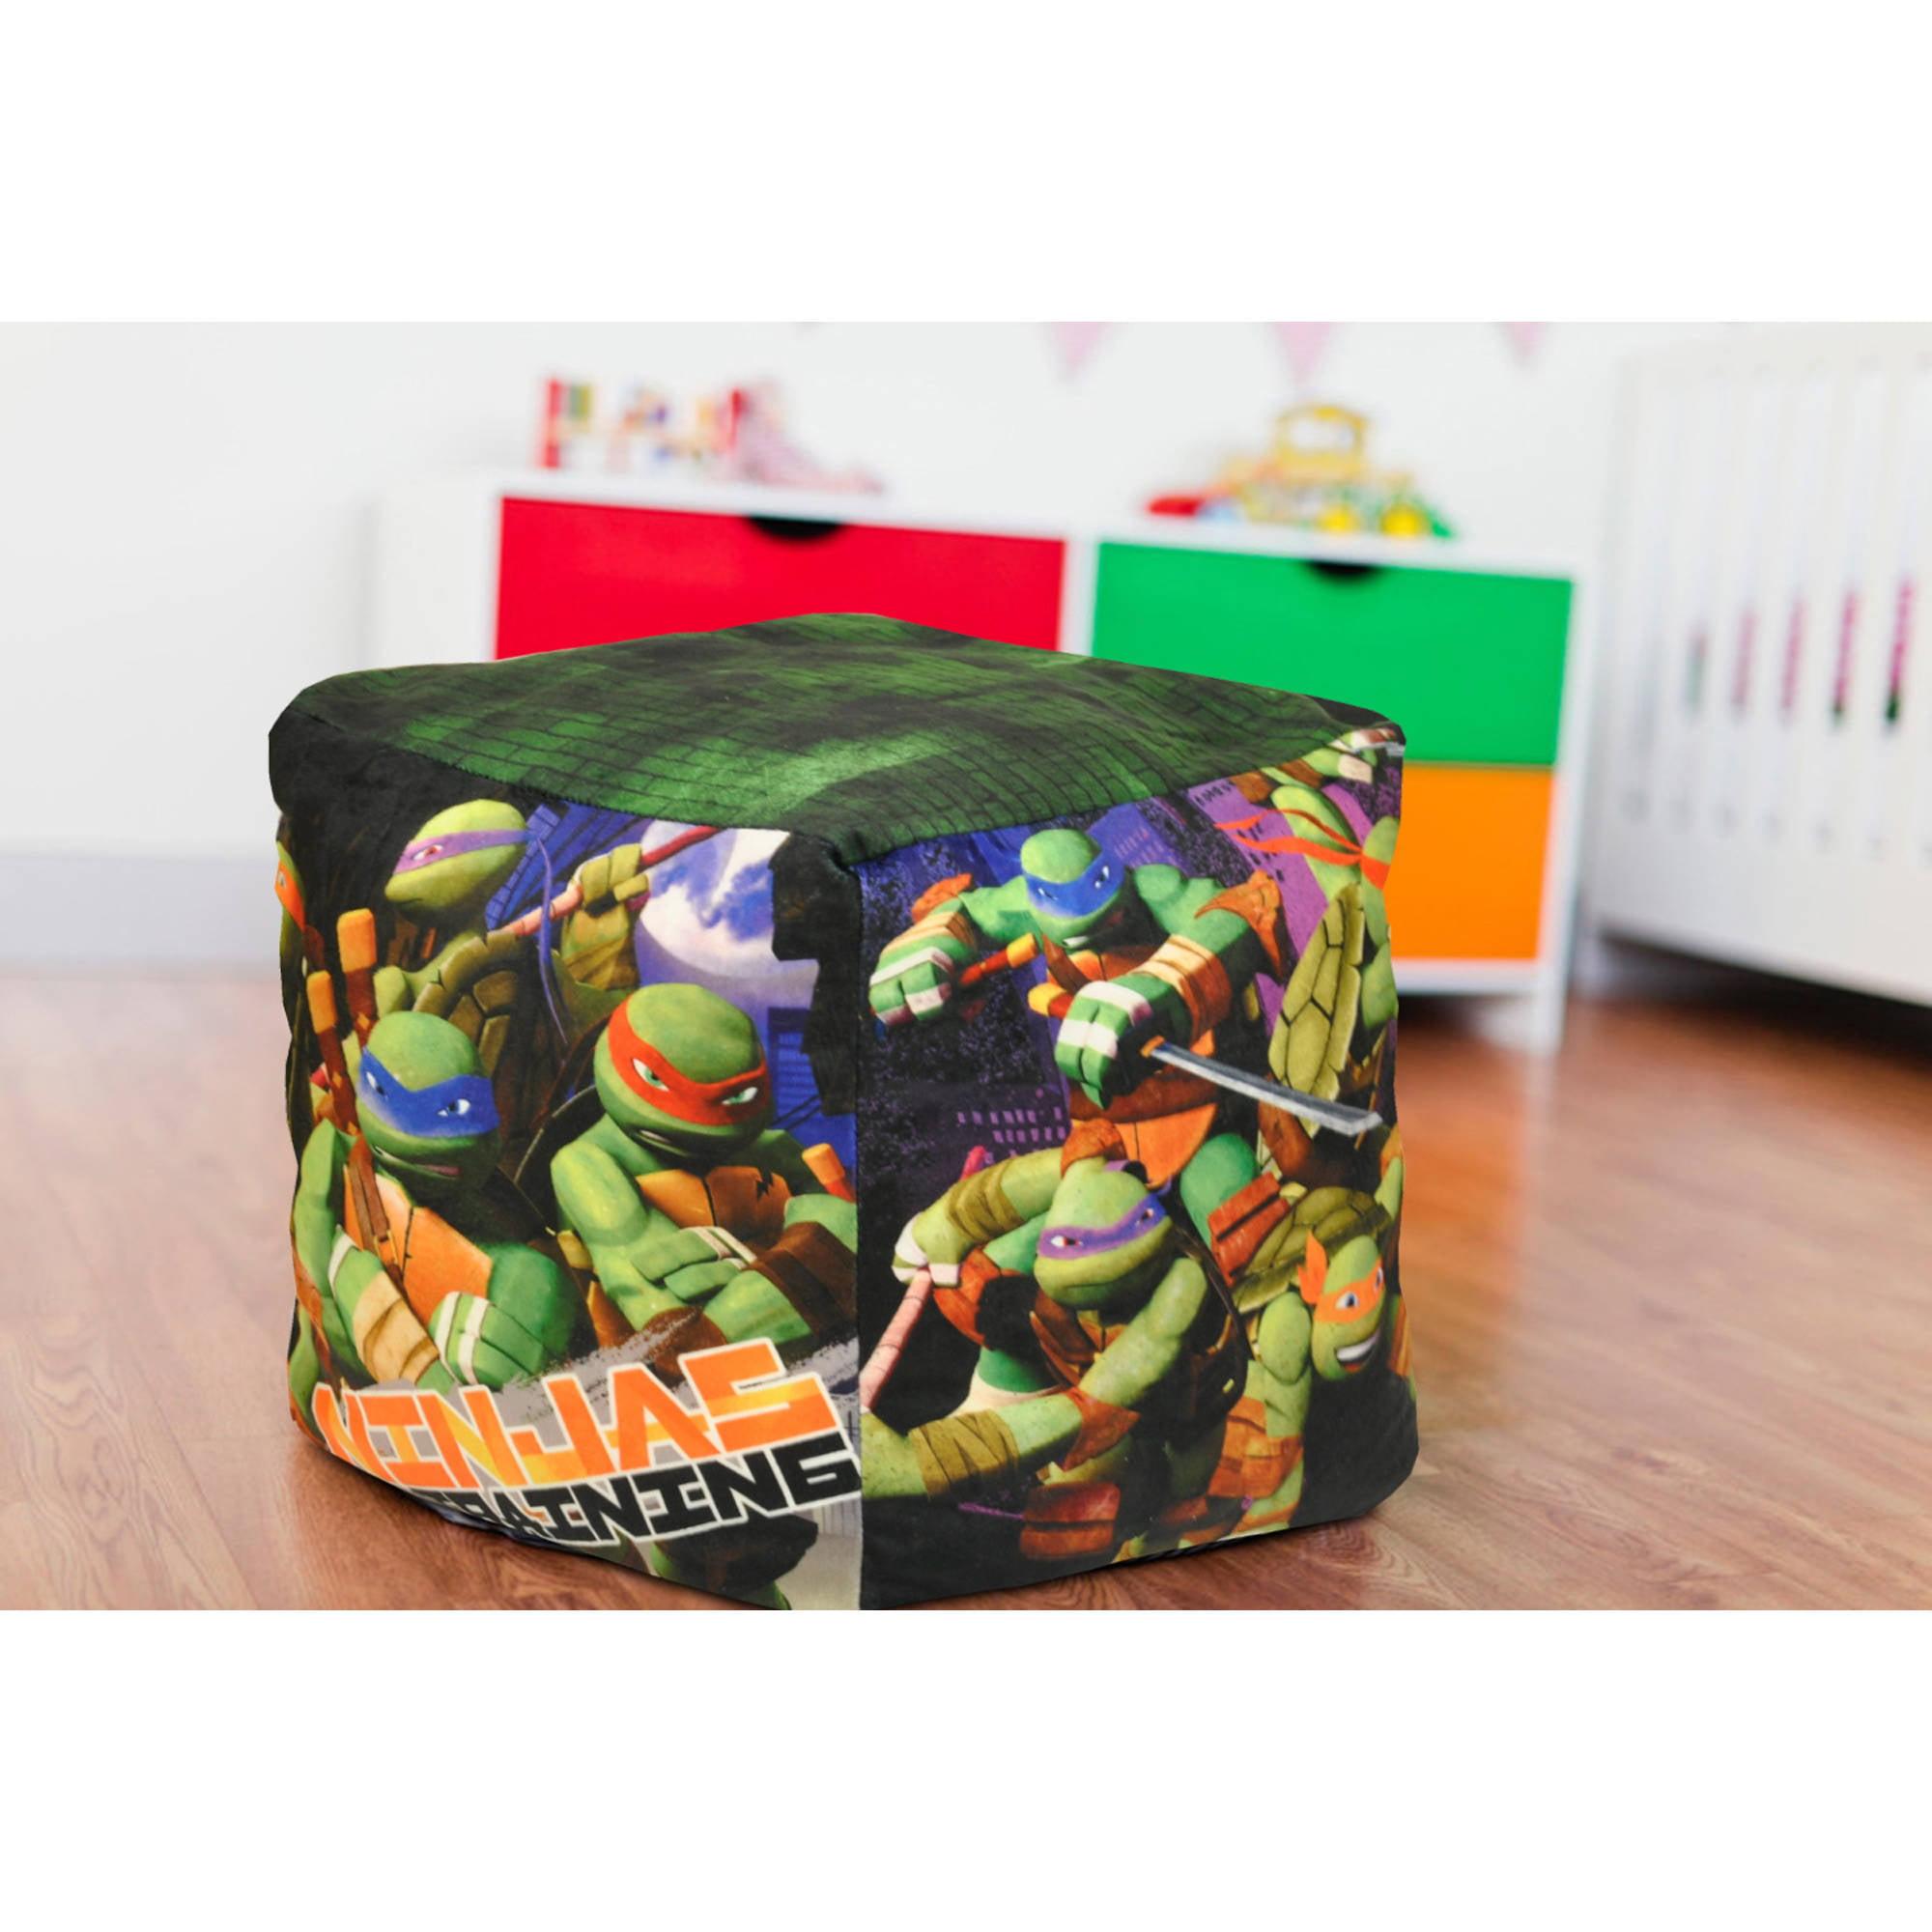 Nickelodeon Teenage Mutant Ninja Turtles Cube Bean Pouf